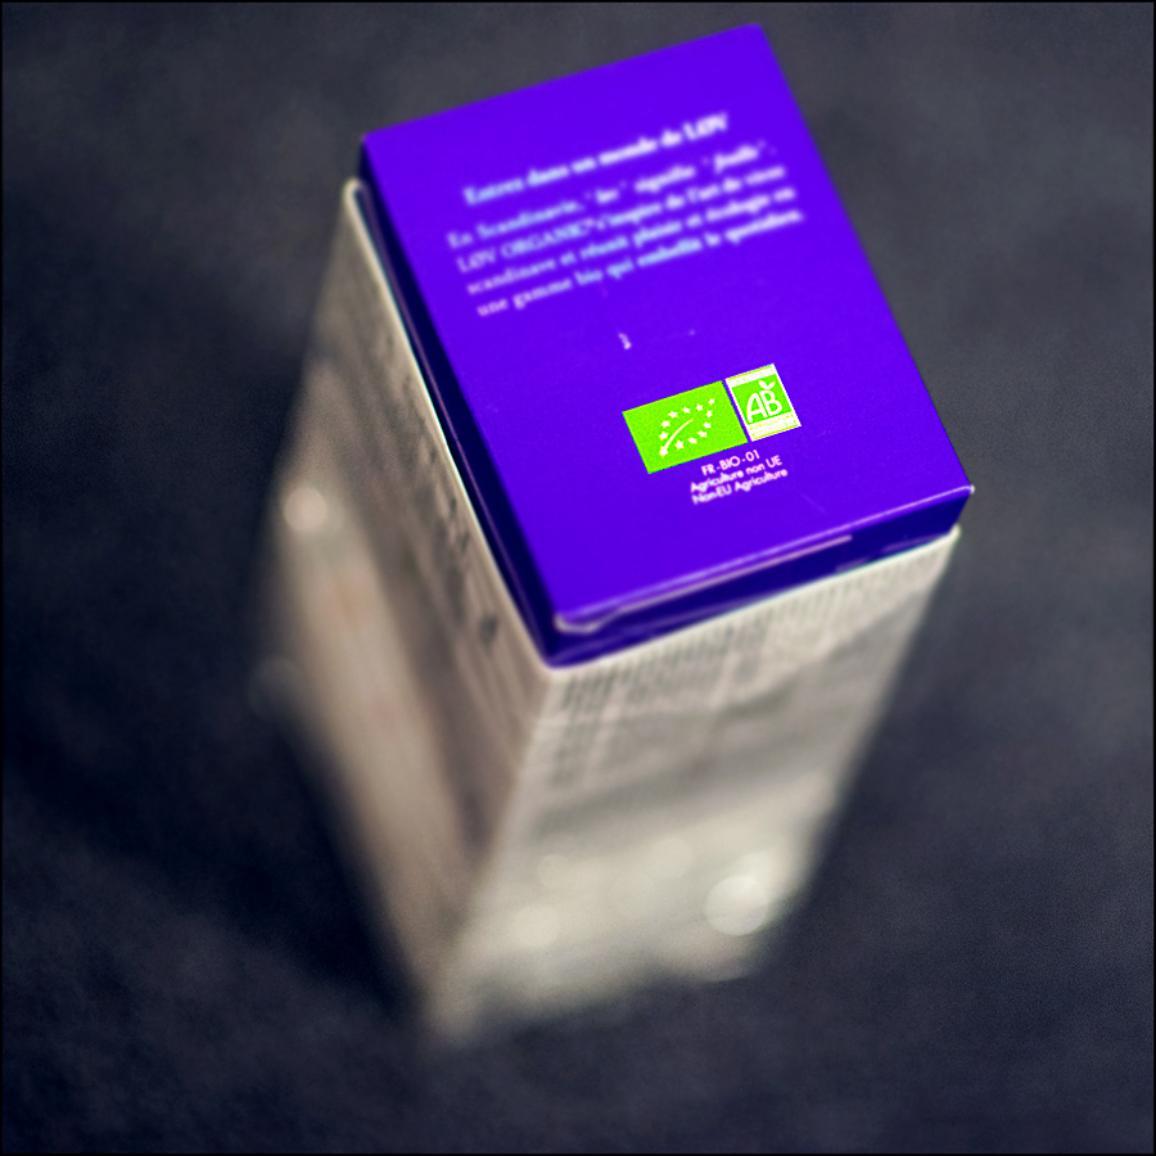 EU Organic Label